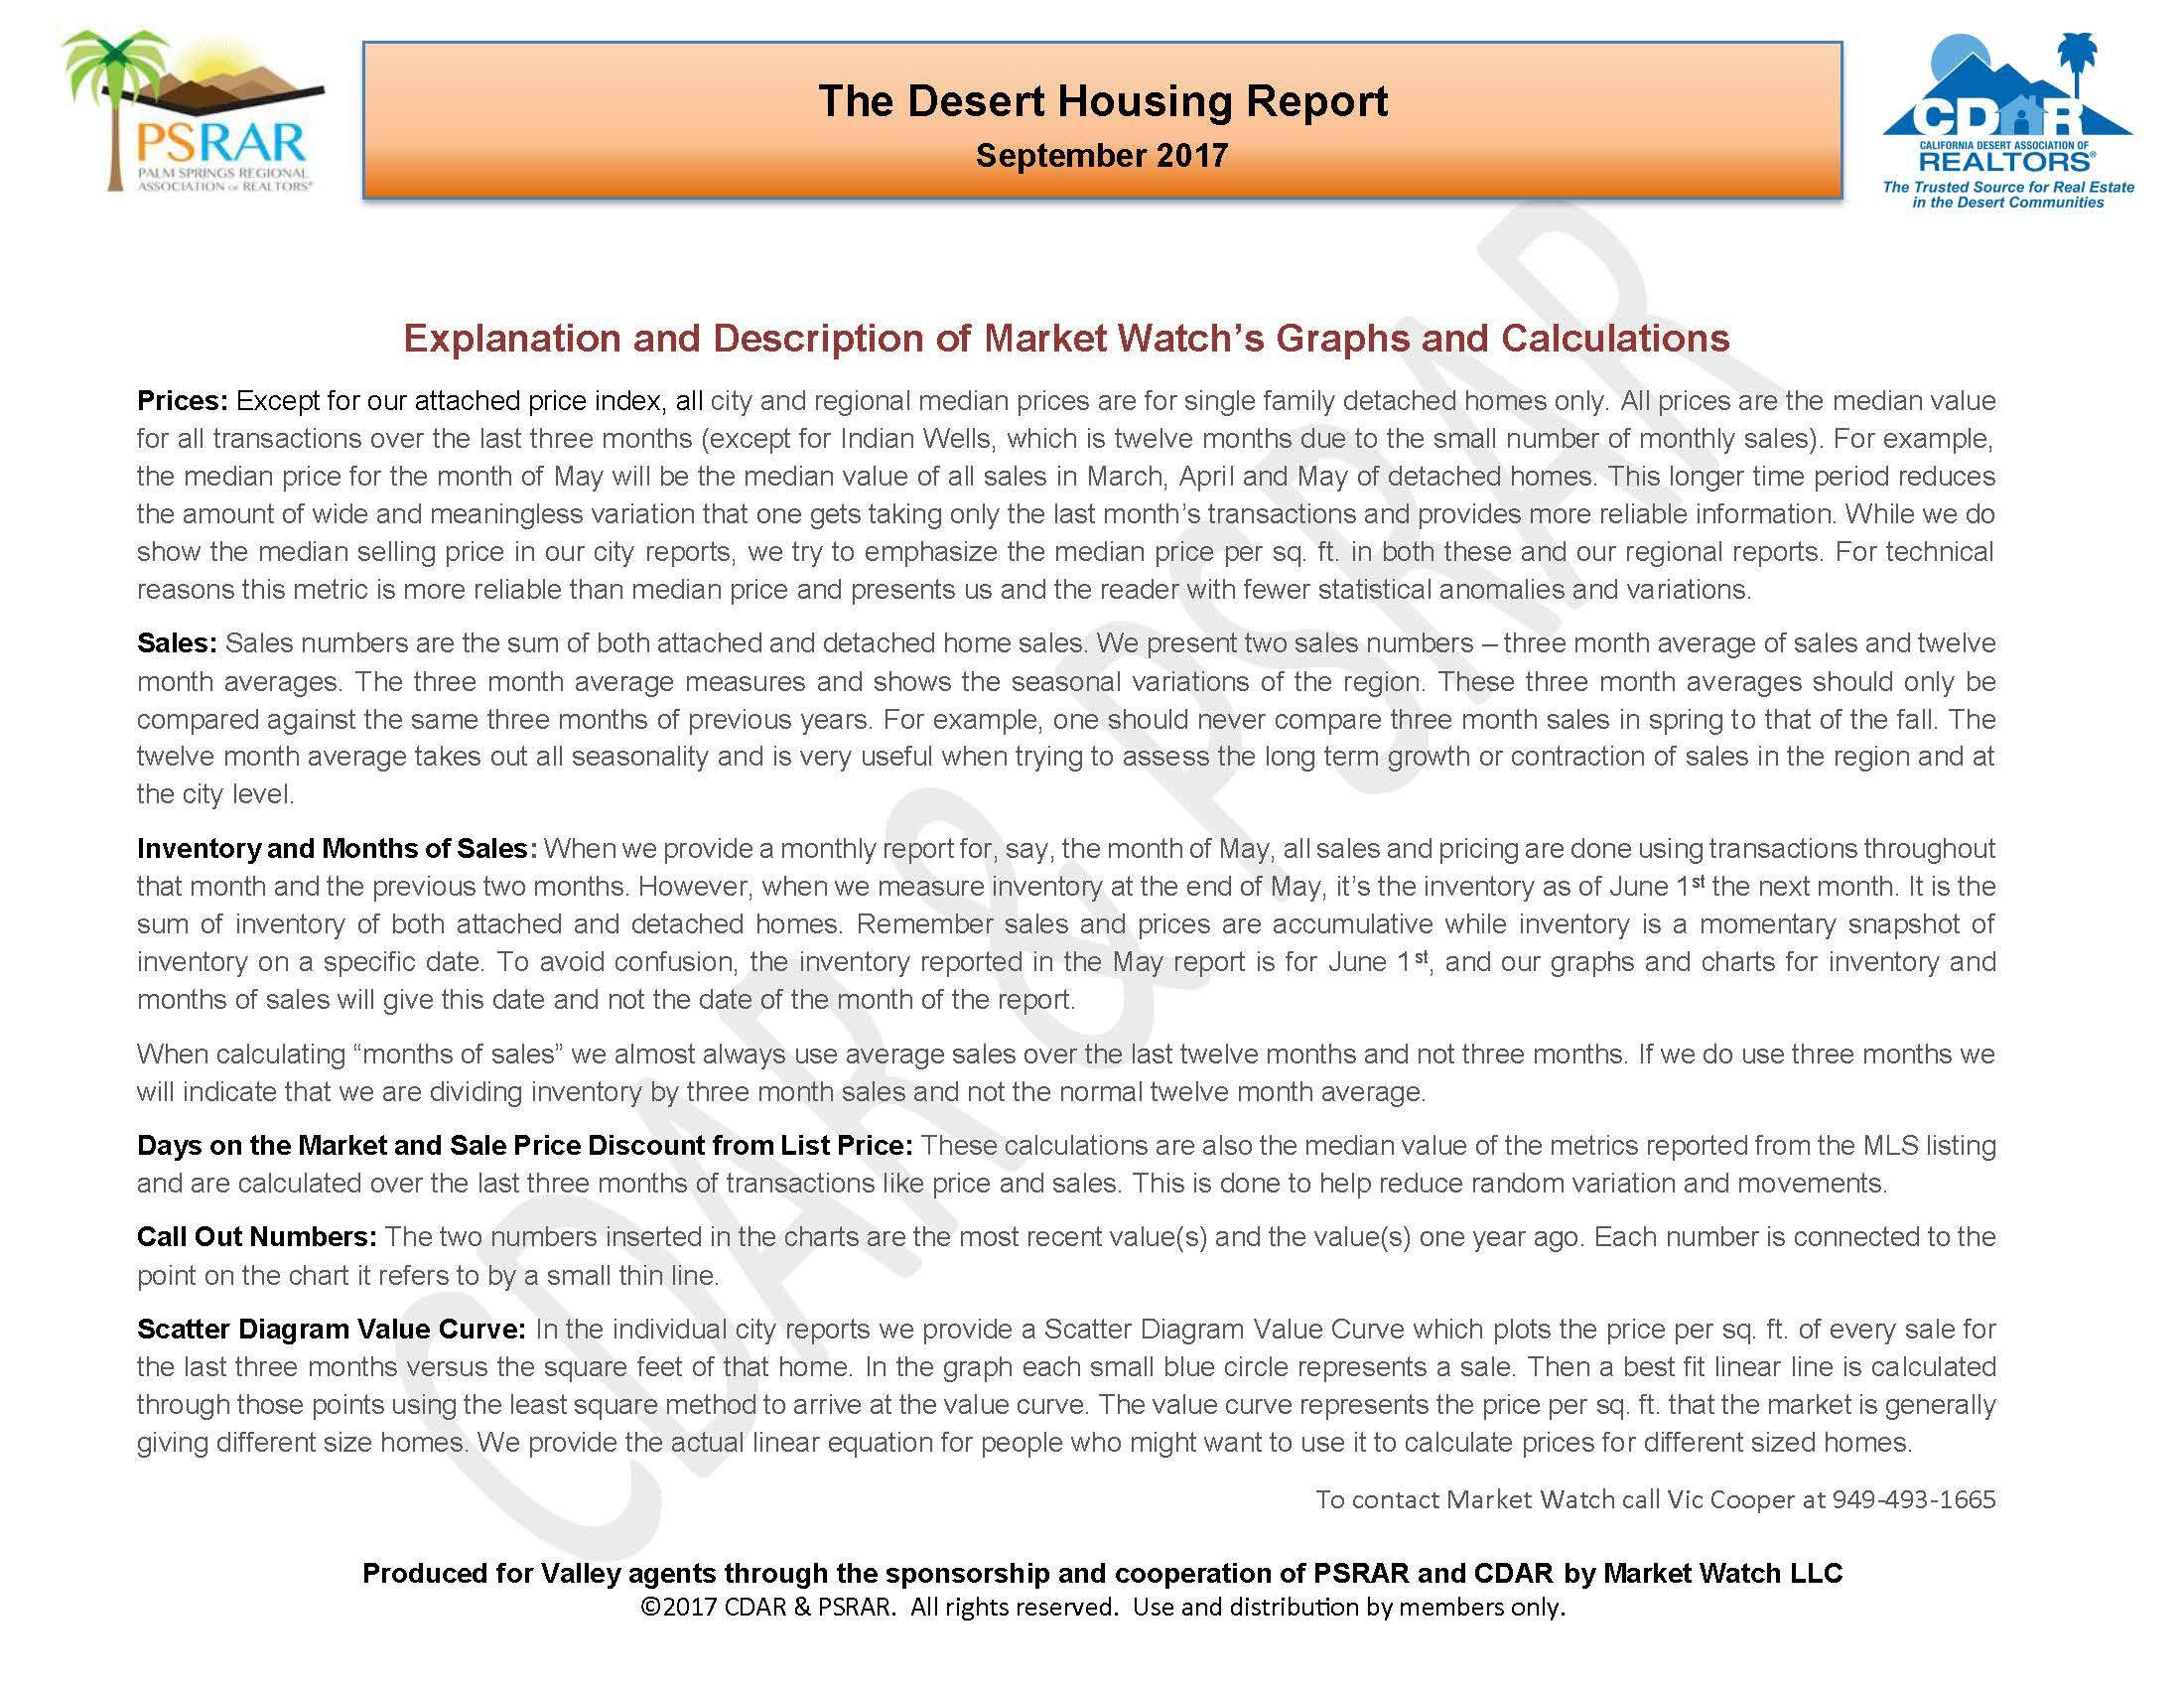 PSRAR & CDAR Monthly Report - Sept 2017_Page_14.jpg